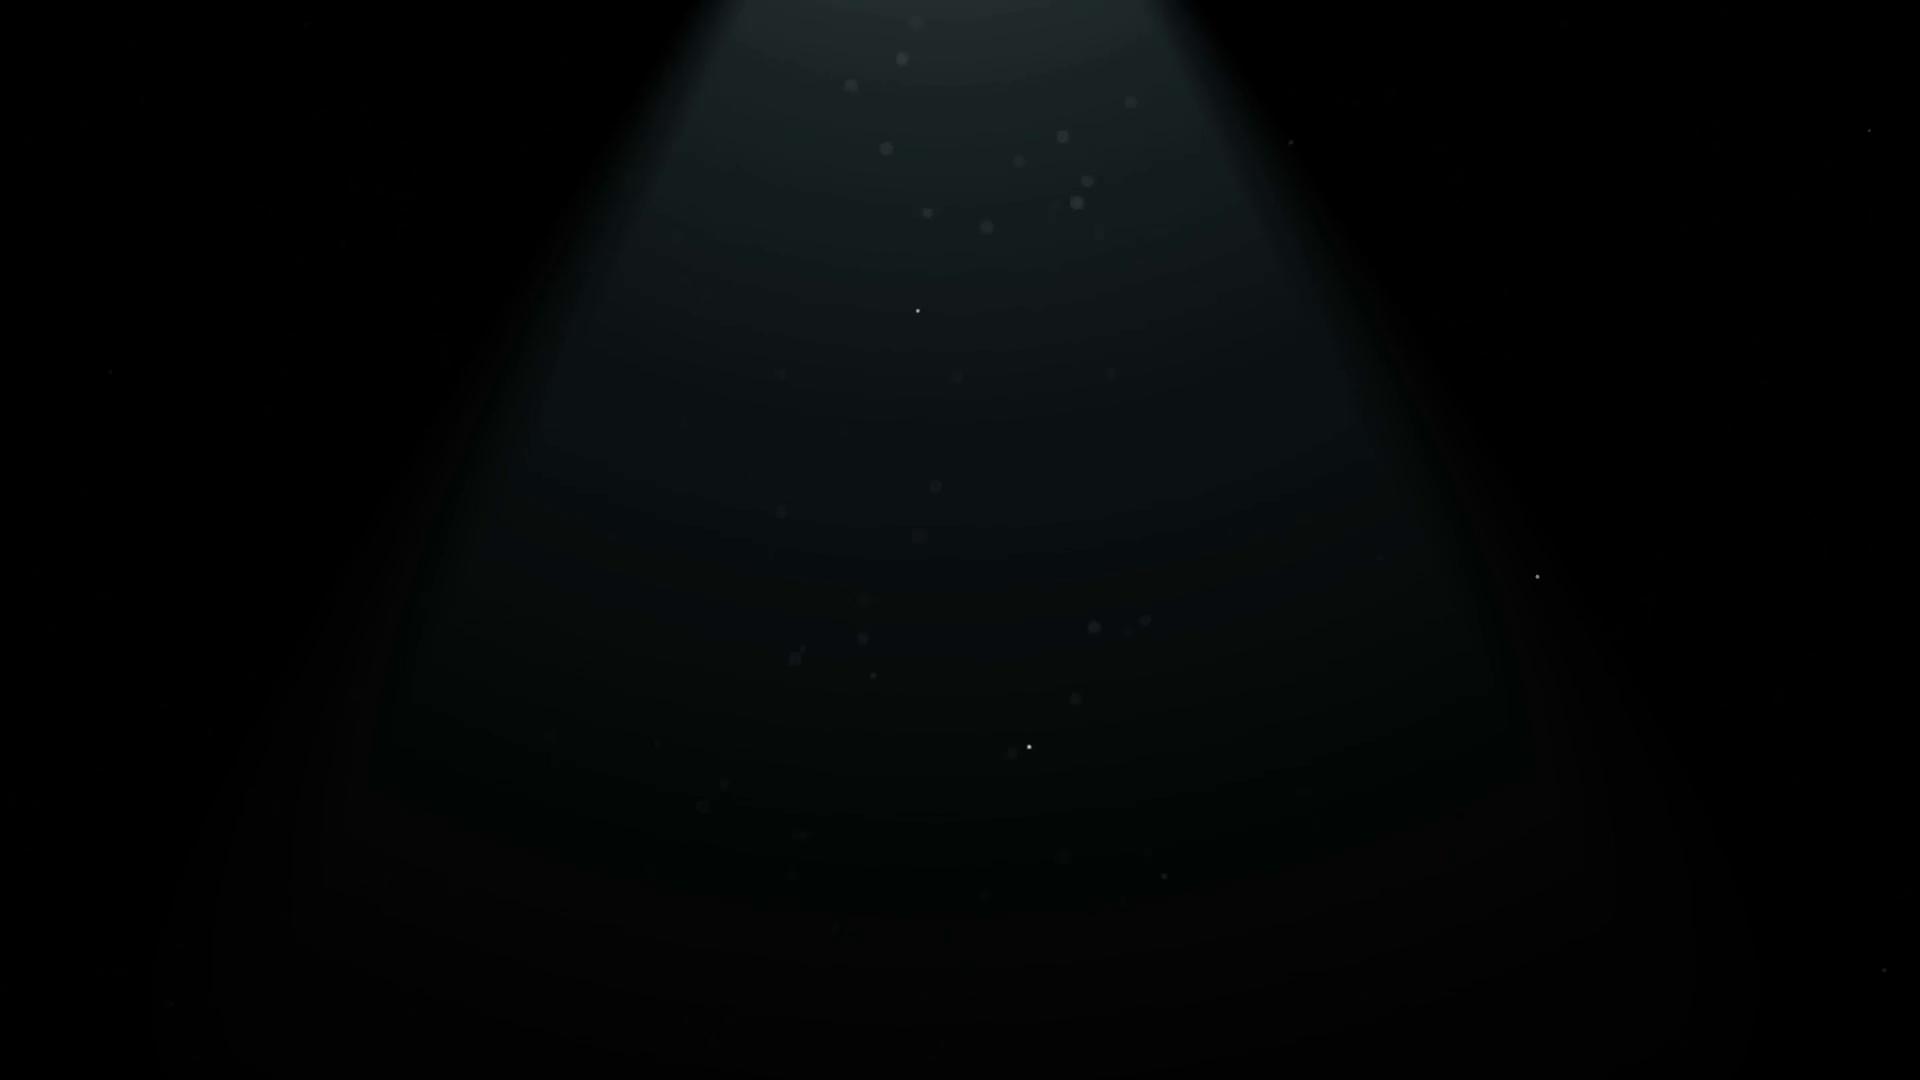 Dark room photo